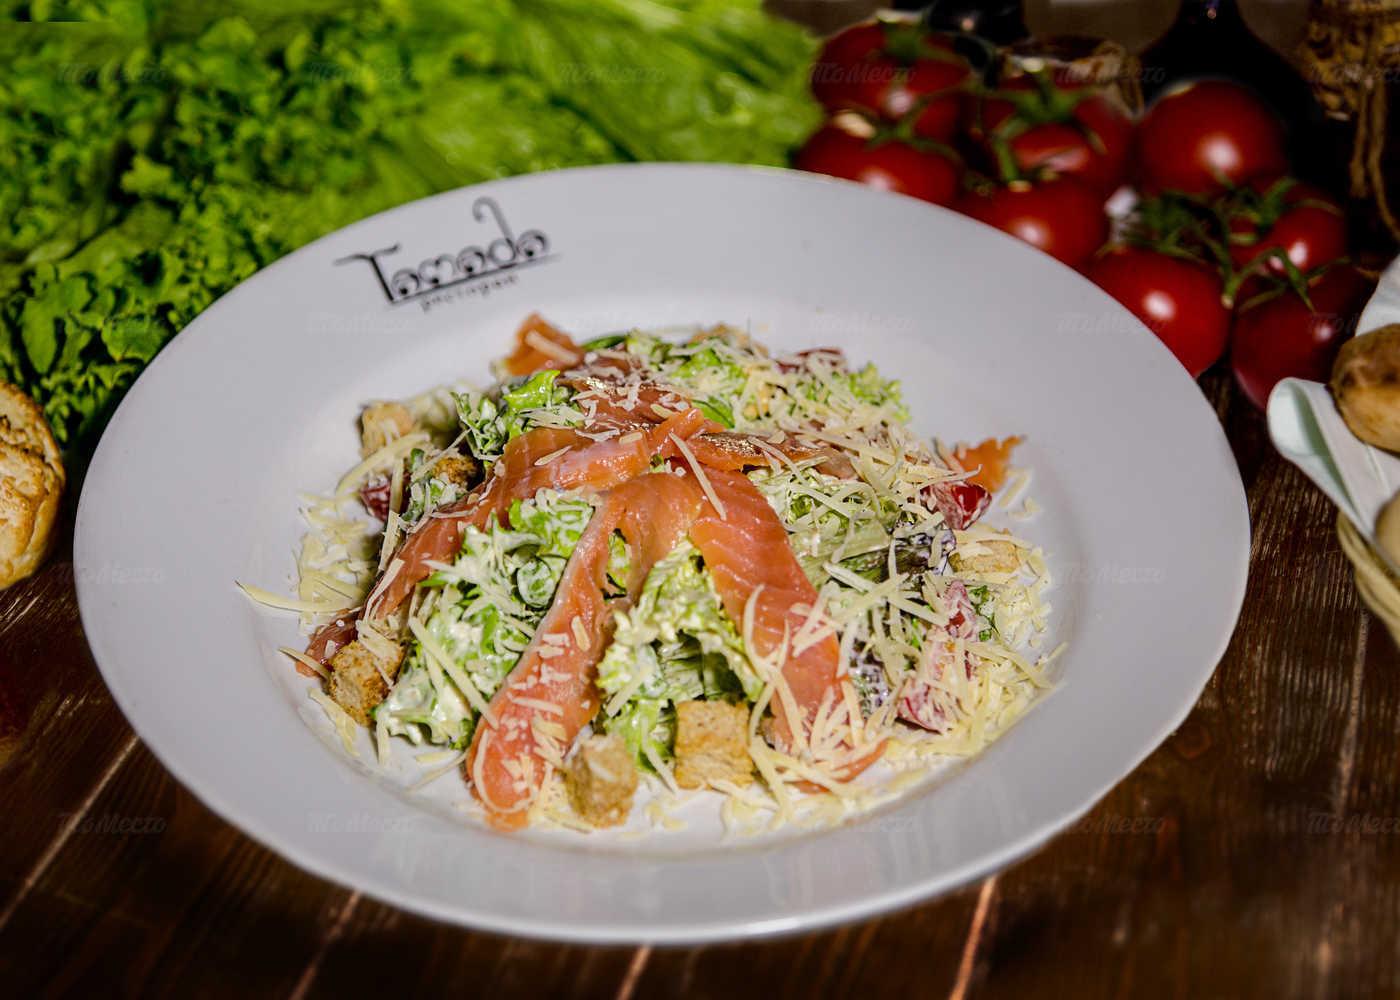 Меню ресторана Тамада на пр. Сельмаш  фото 53